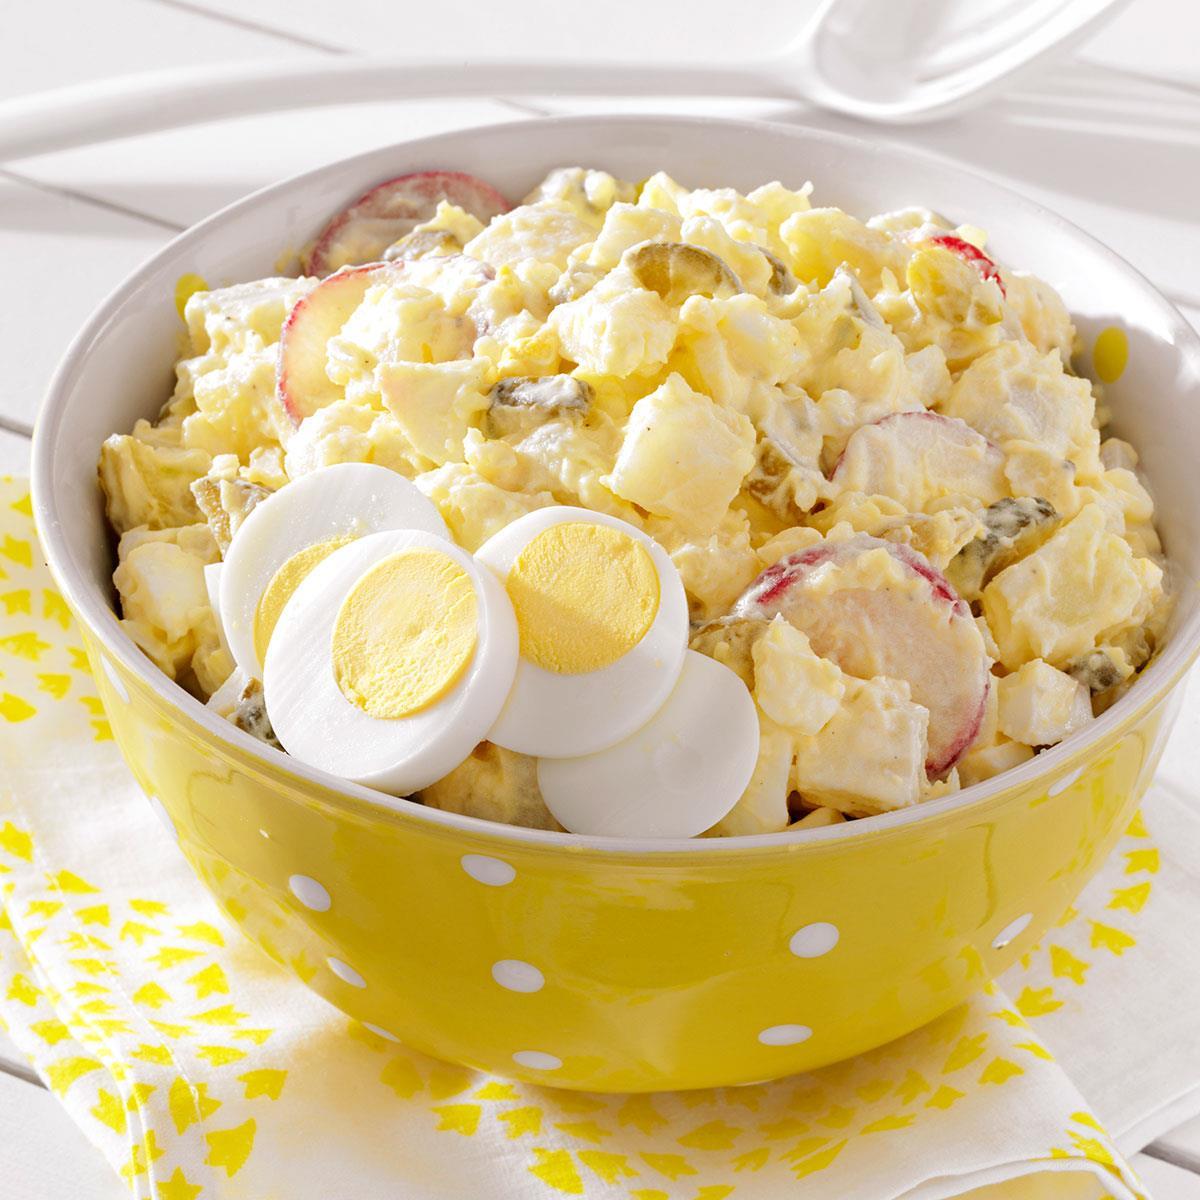 Comfort Food Wedding Menu: Deli-Style Potato Salad Recipe